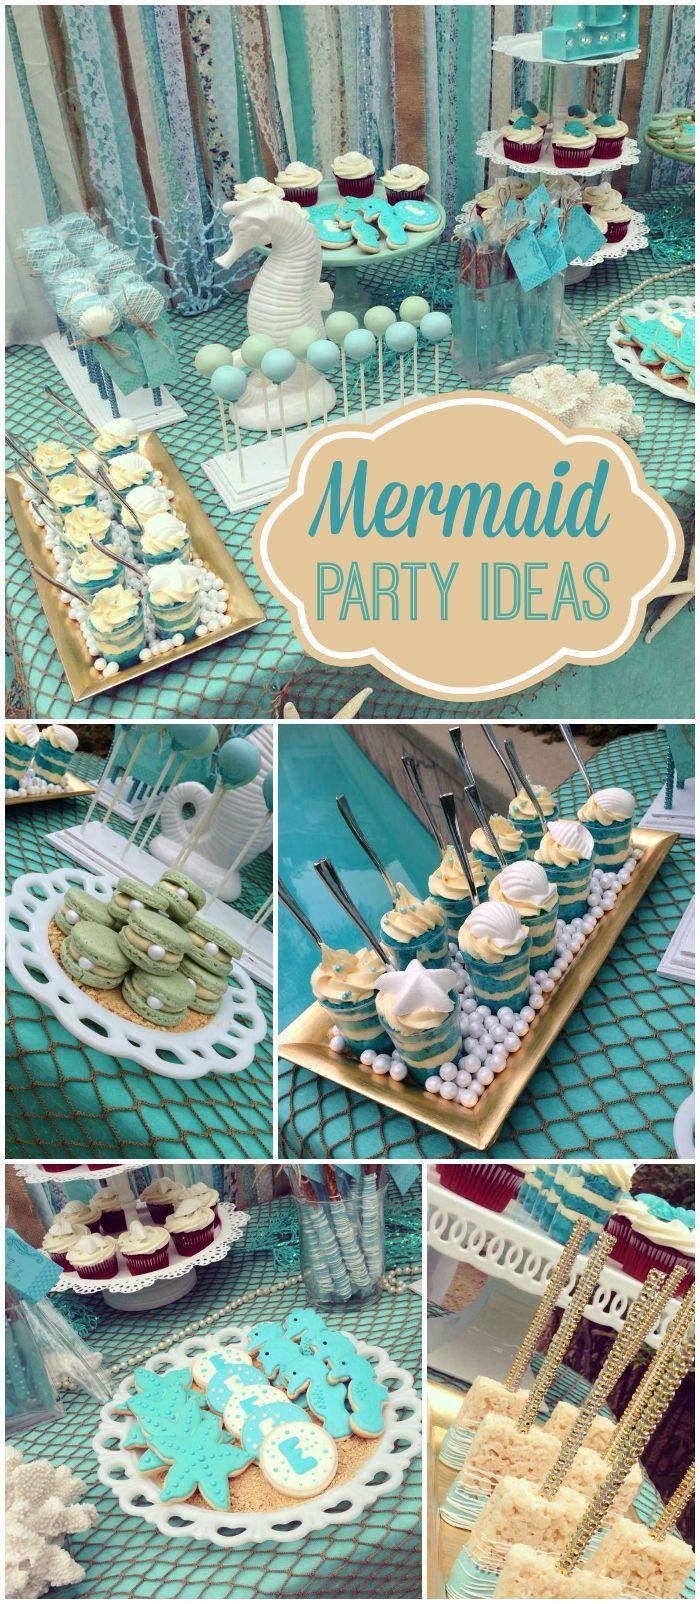 Backyard Birthday Party Ideas Sweet 16 backyard parties 25 Best Ideas About Sweet 16 Parties On Pinterest Sweet 16 Party Themes Sweet 16 Themes And Sweet 16 Food Ideas